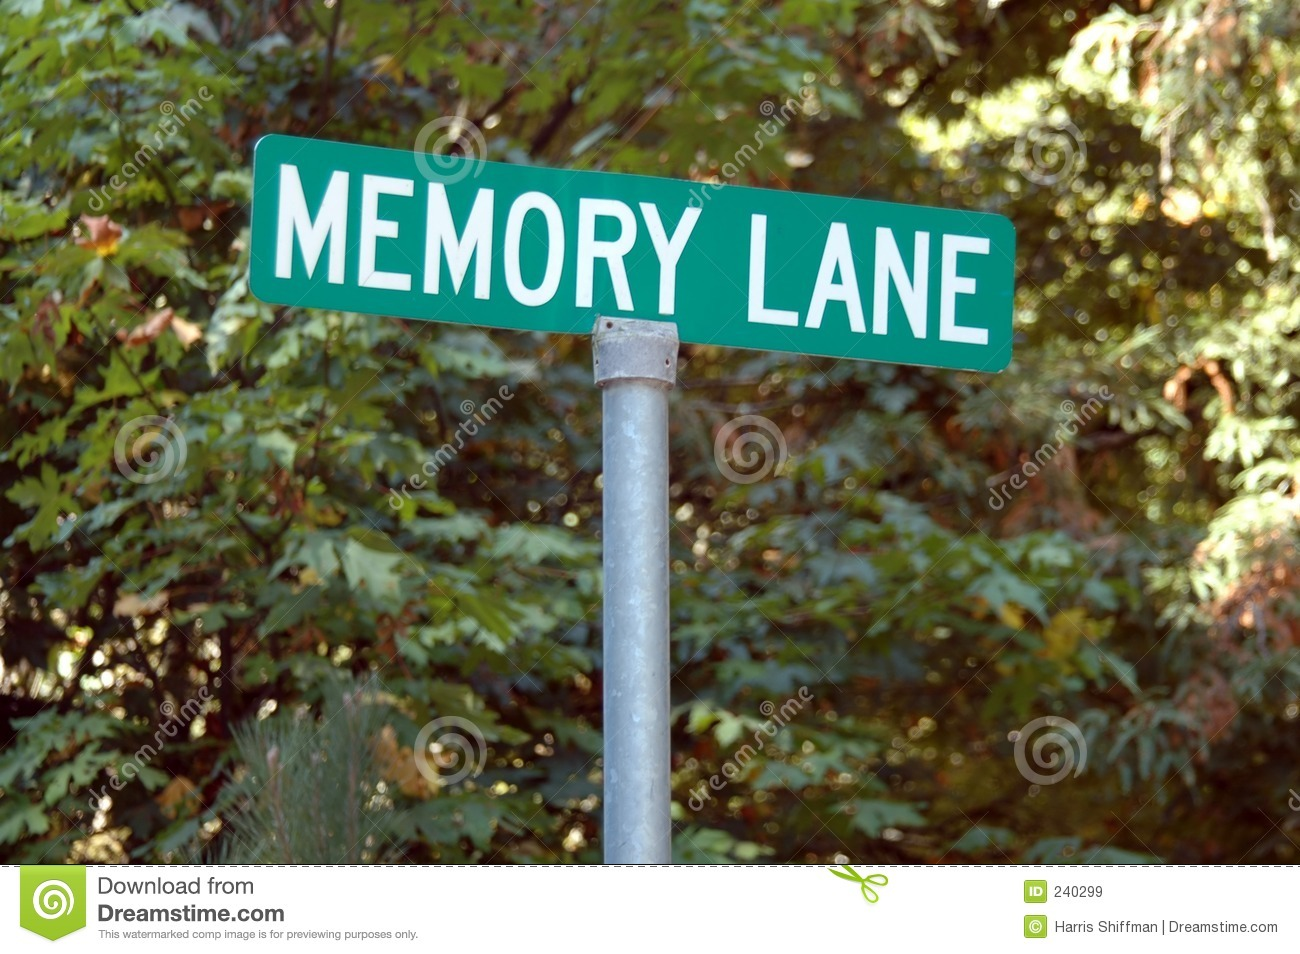 Memory Lane Clipart - Clipart Kid